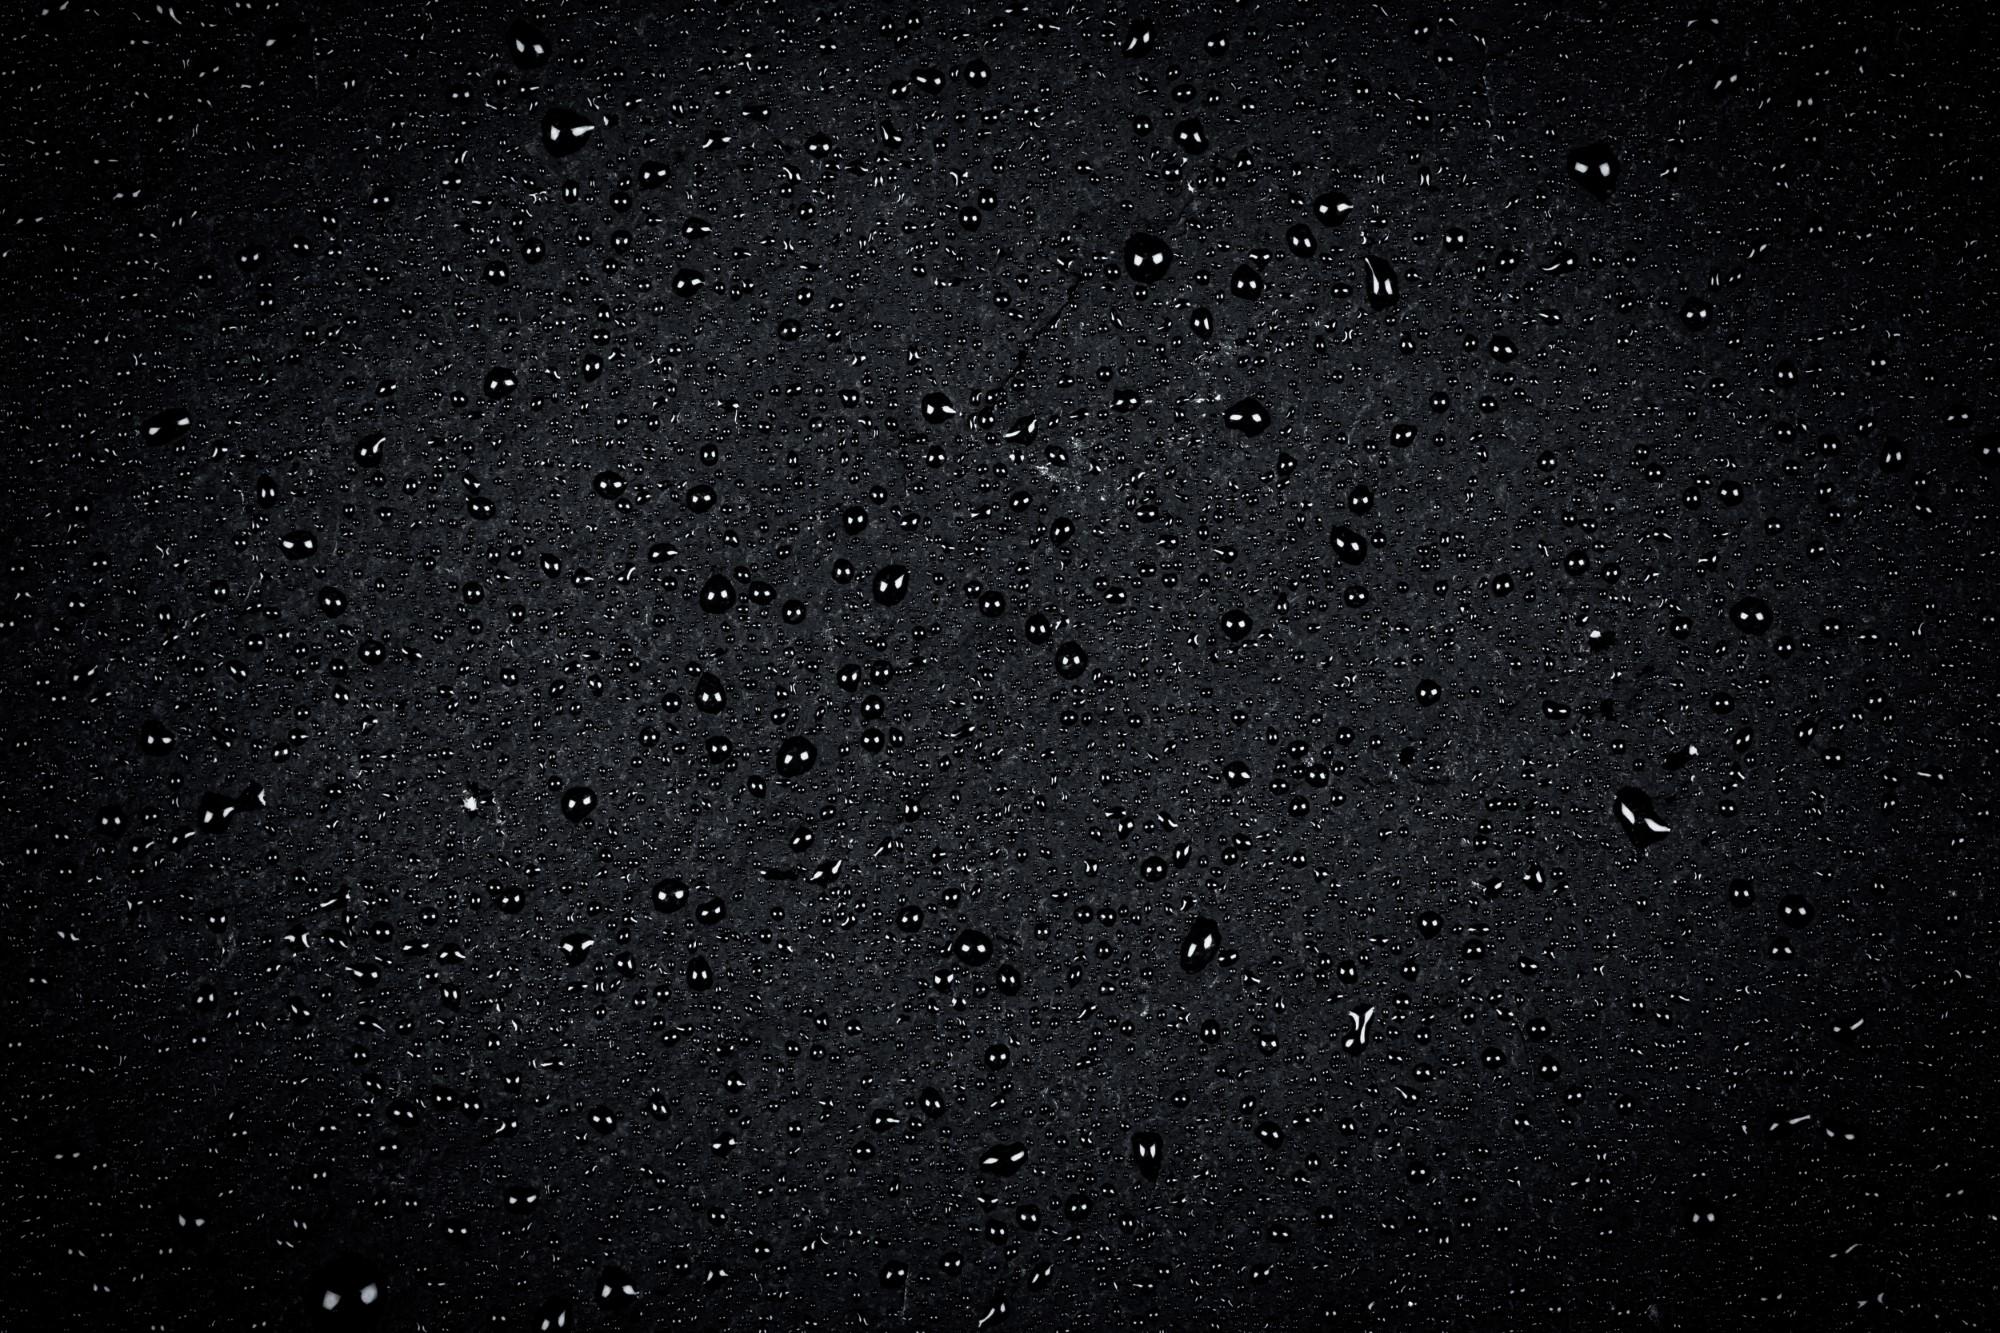 Water drops on dark stone